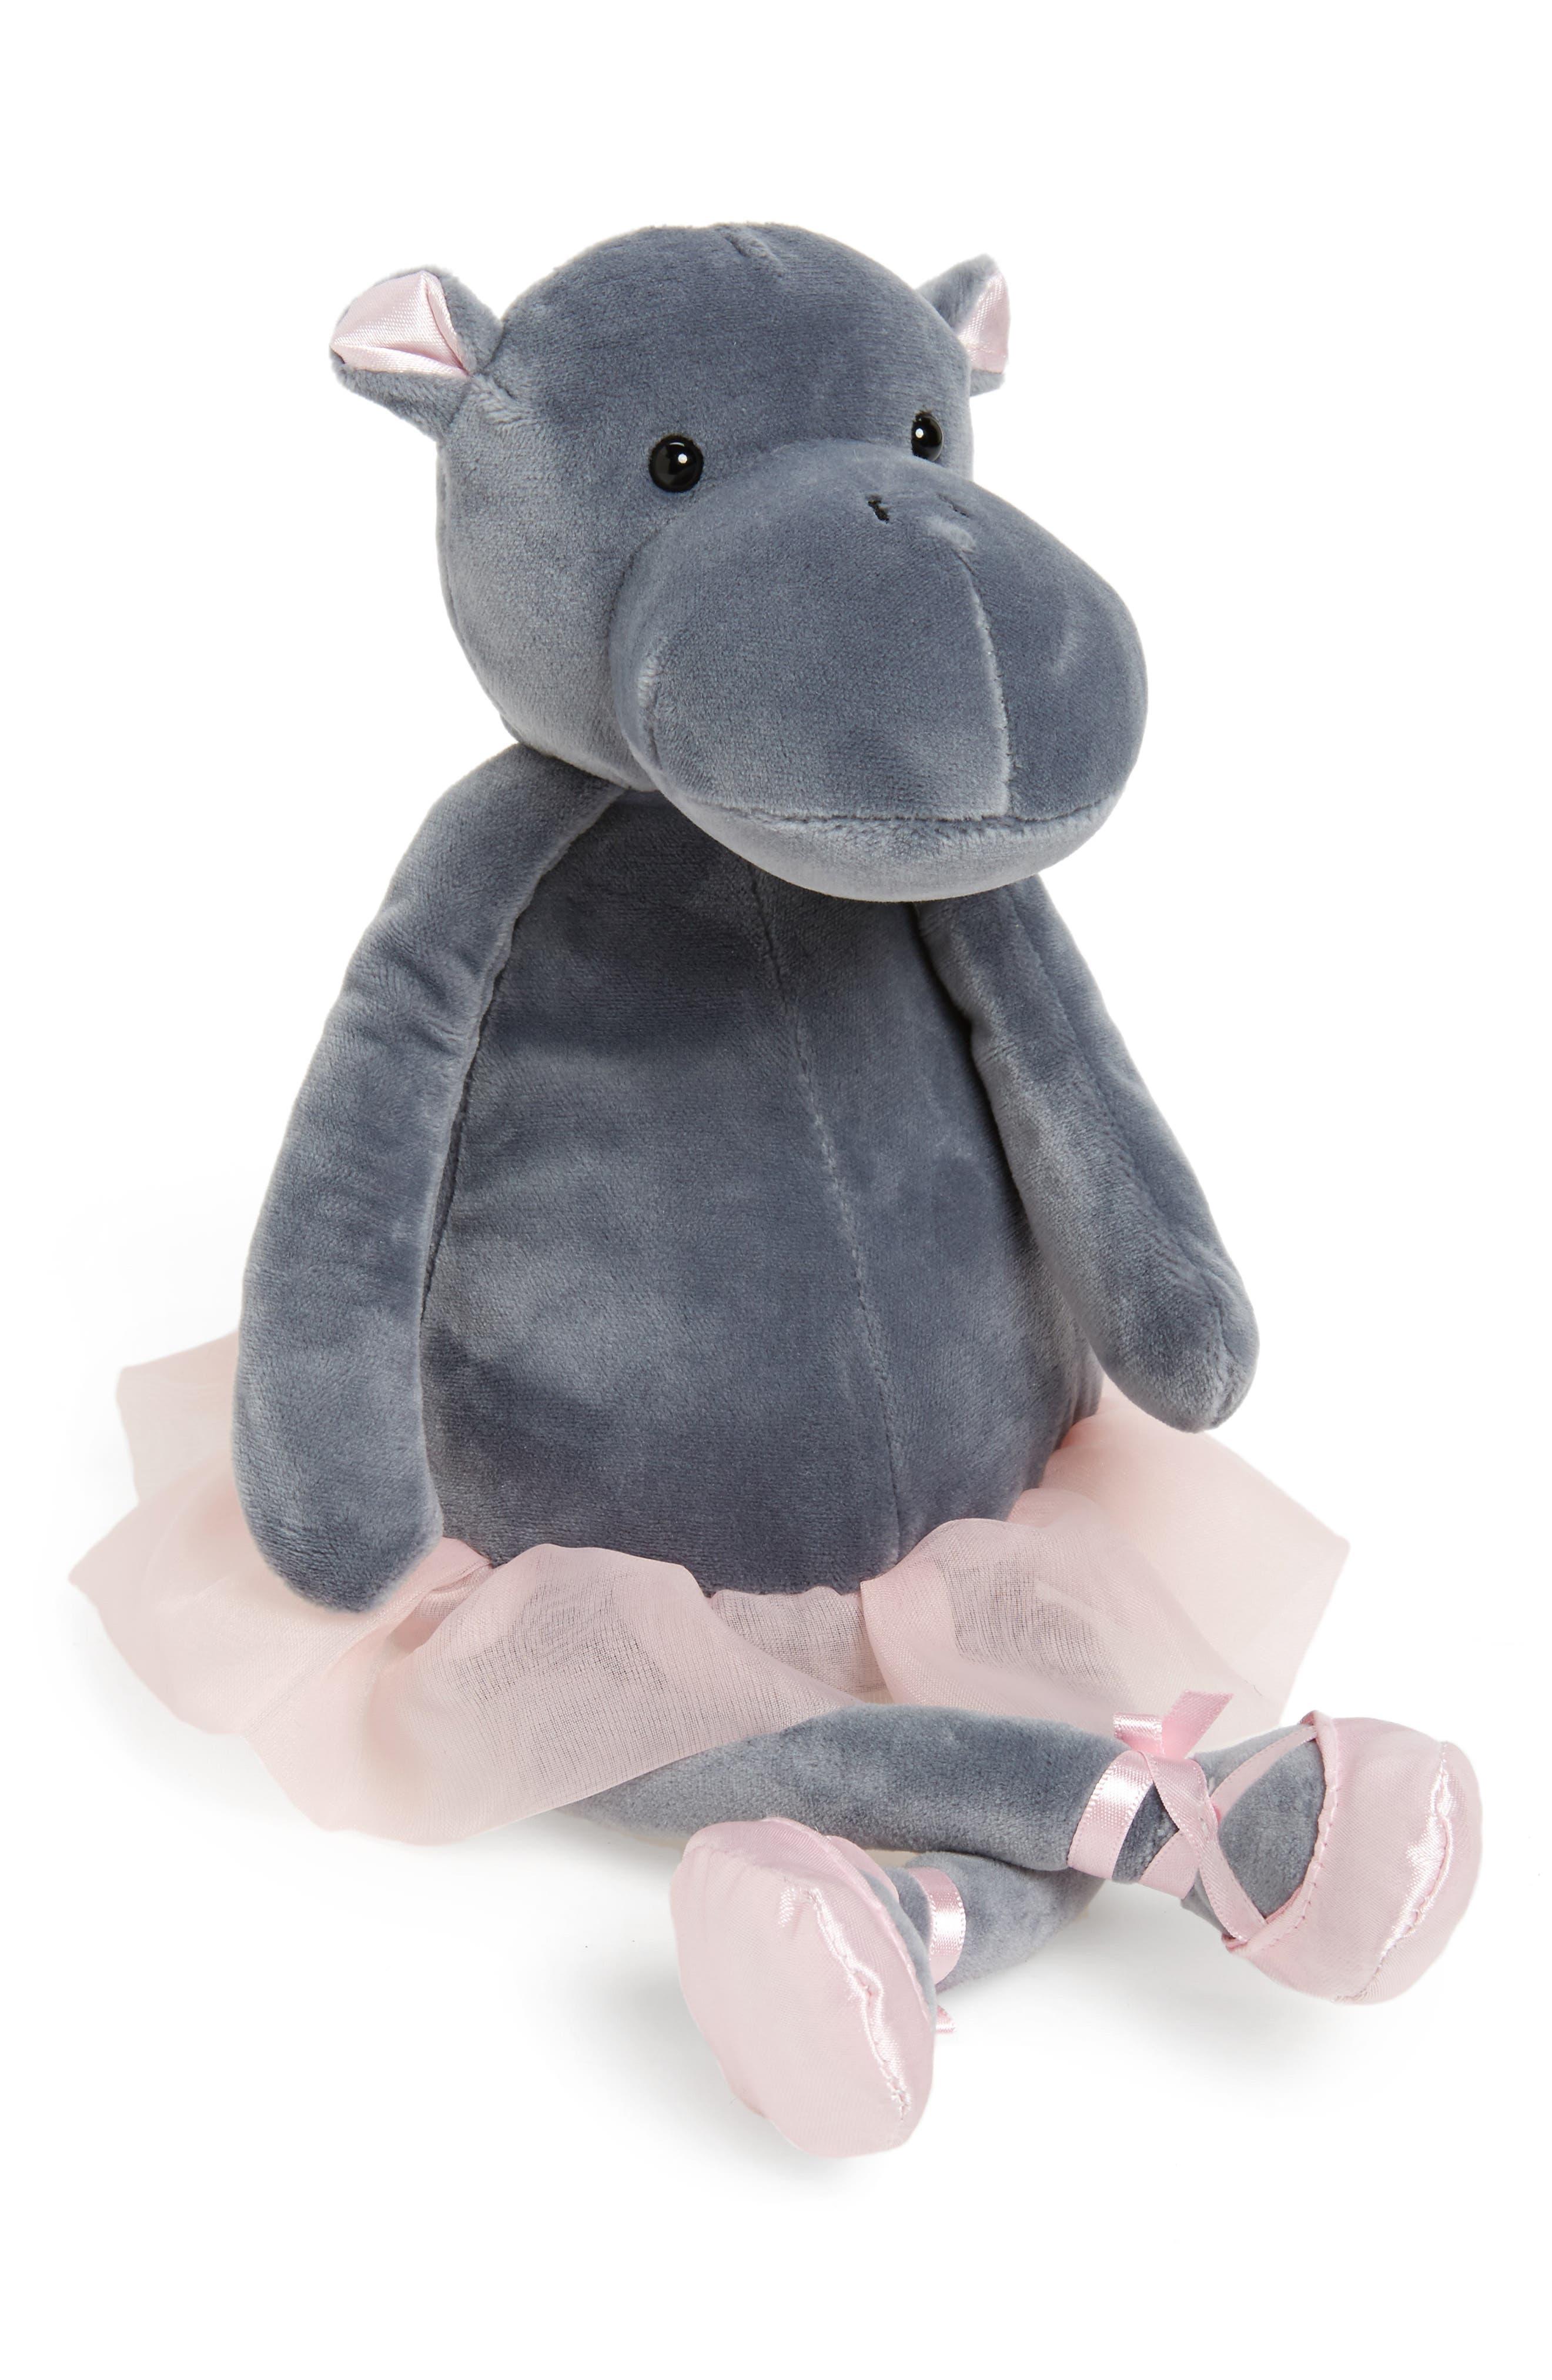 Dancing Darcey - Hippo Stuffed Animal,                             Main thumbnail 1, color,                             020